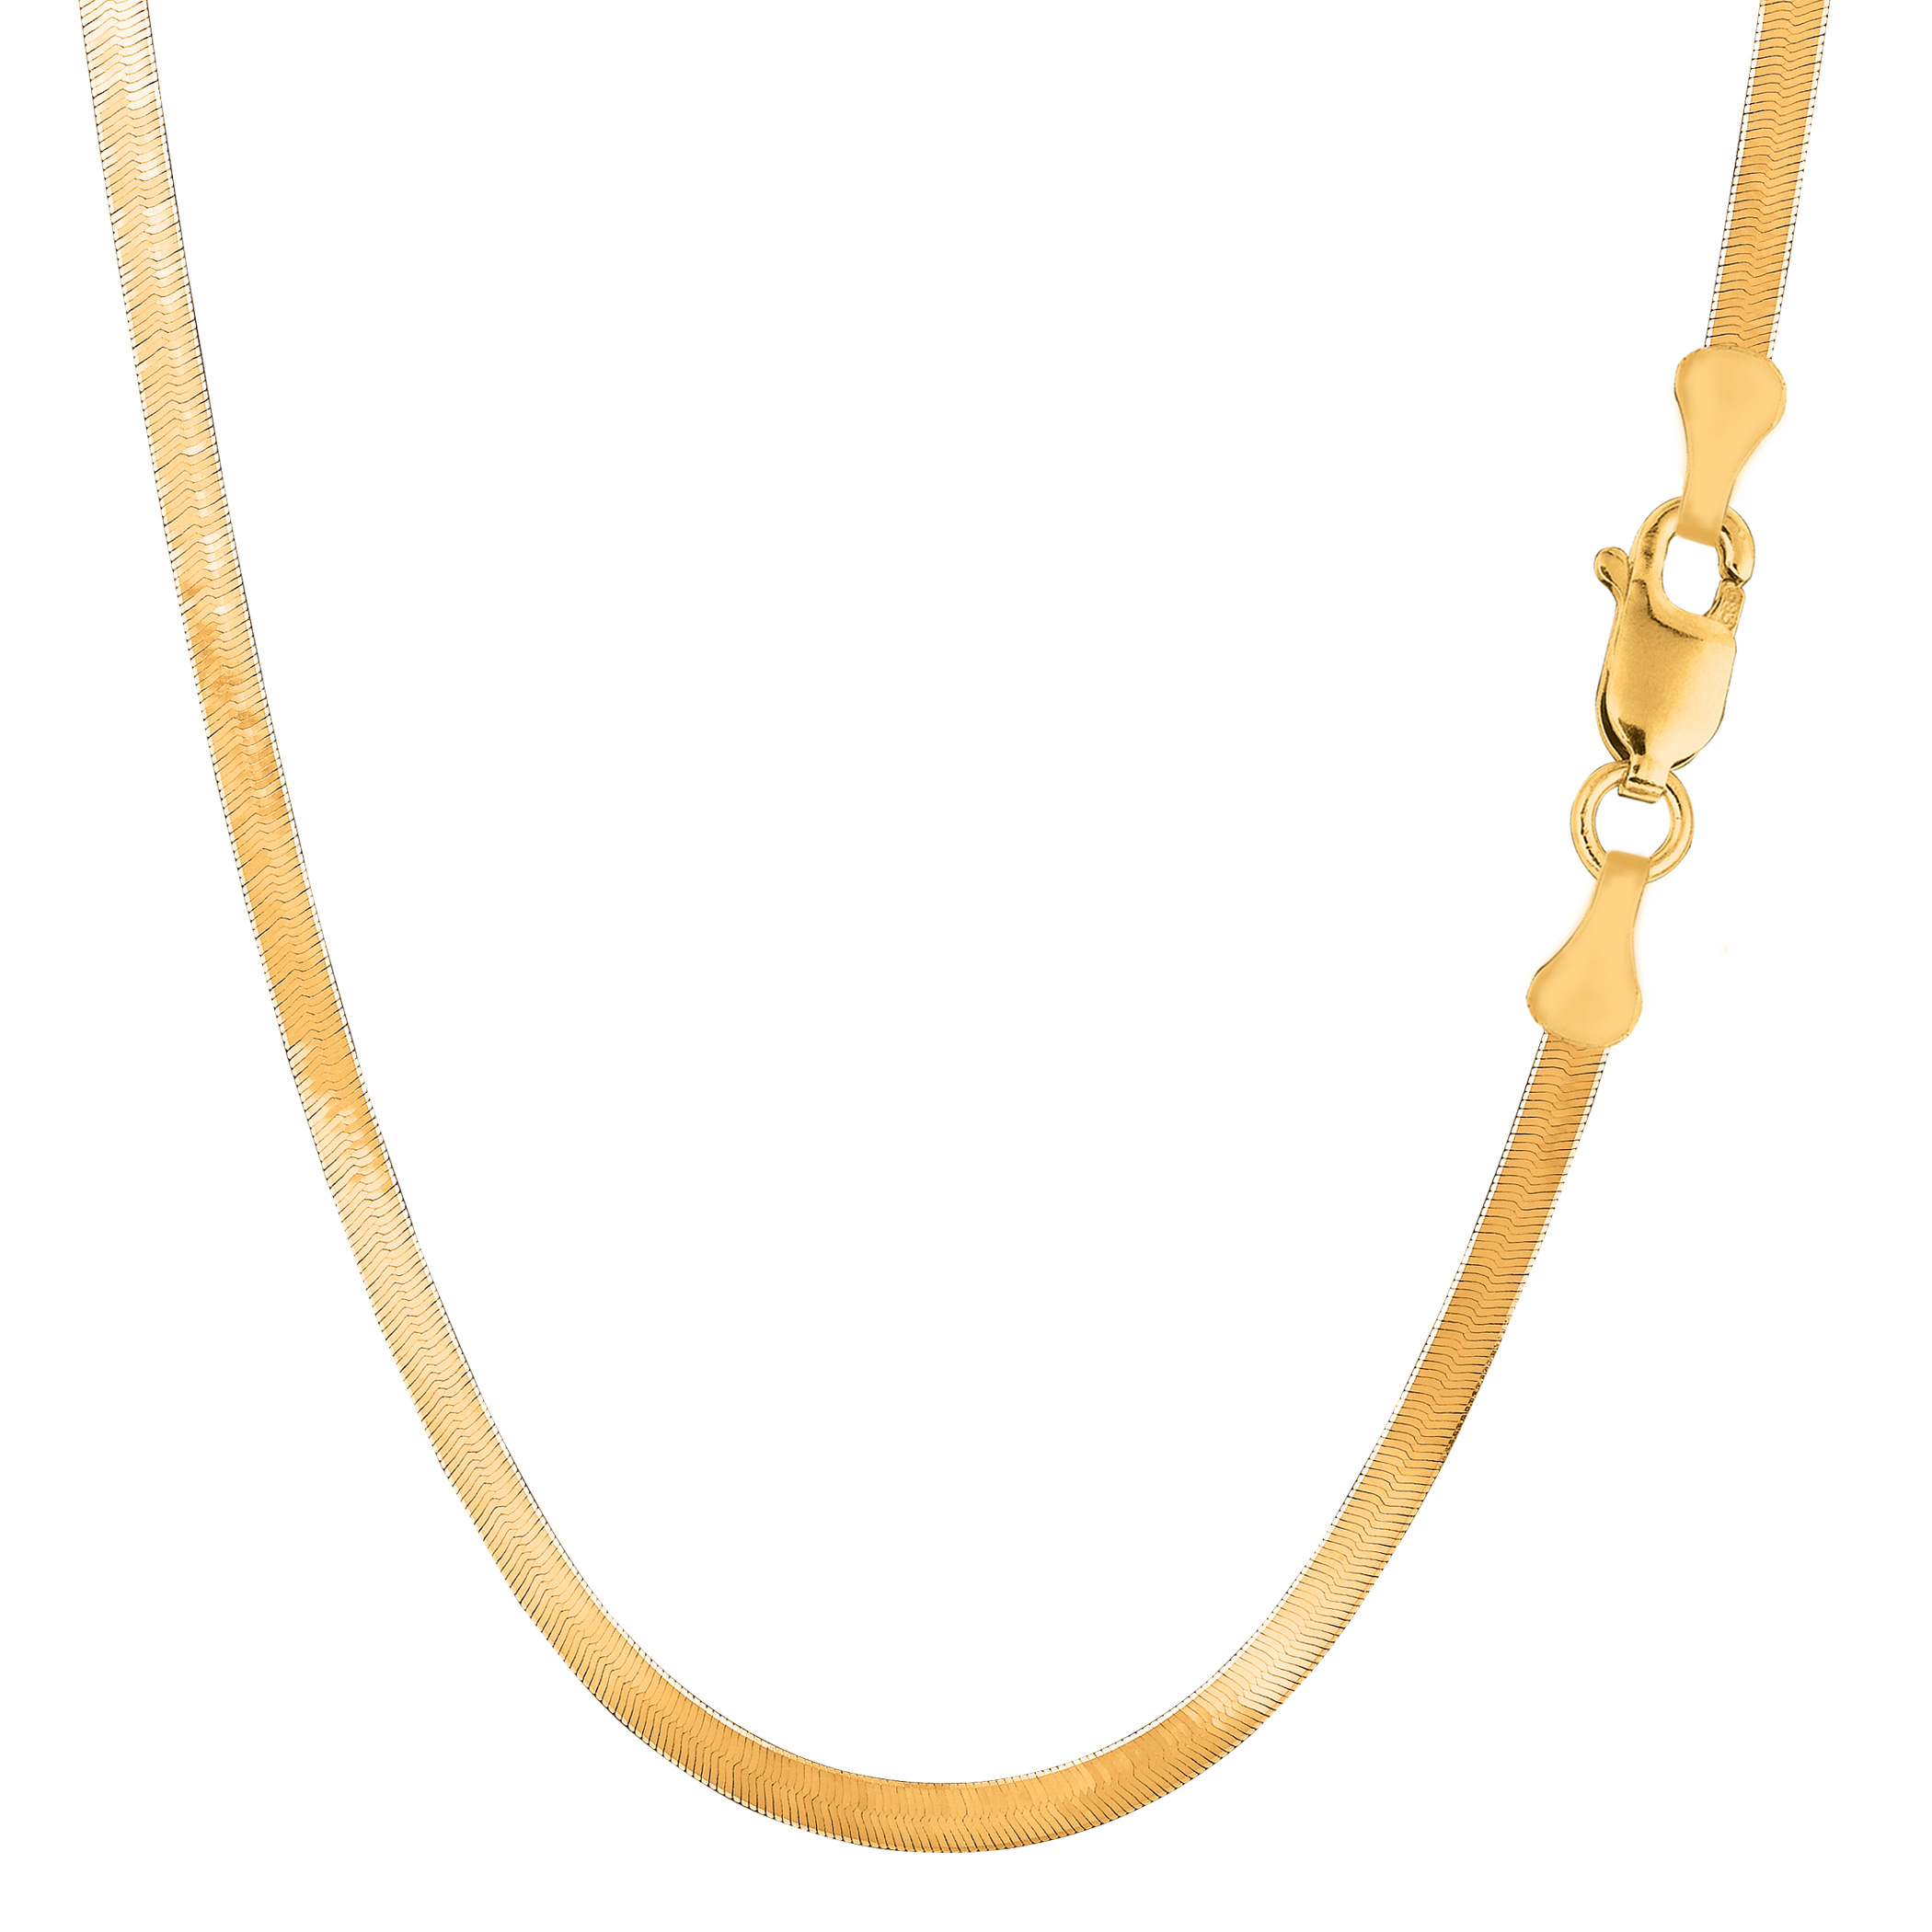 16 Inch Gold Herringbone Necklace: 14k Yellow Gold Imperial Herringbone Chain Width 3 0mm